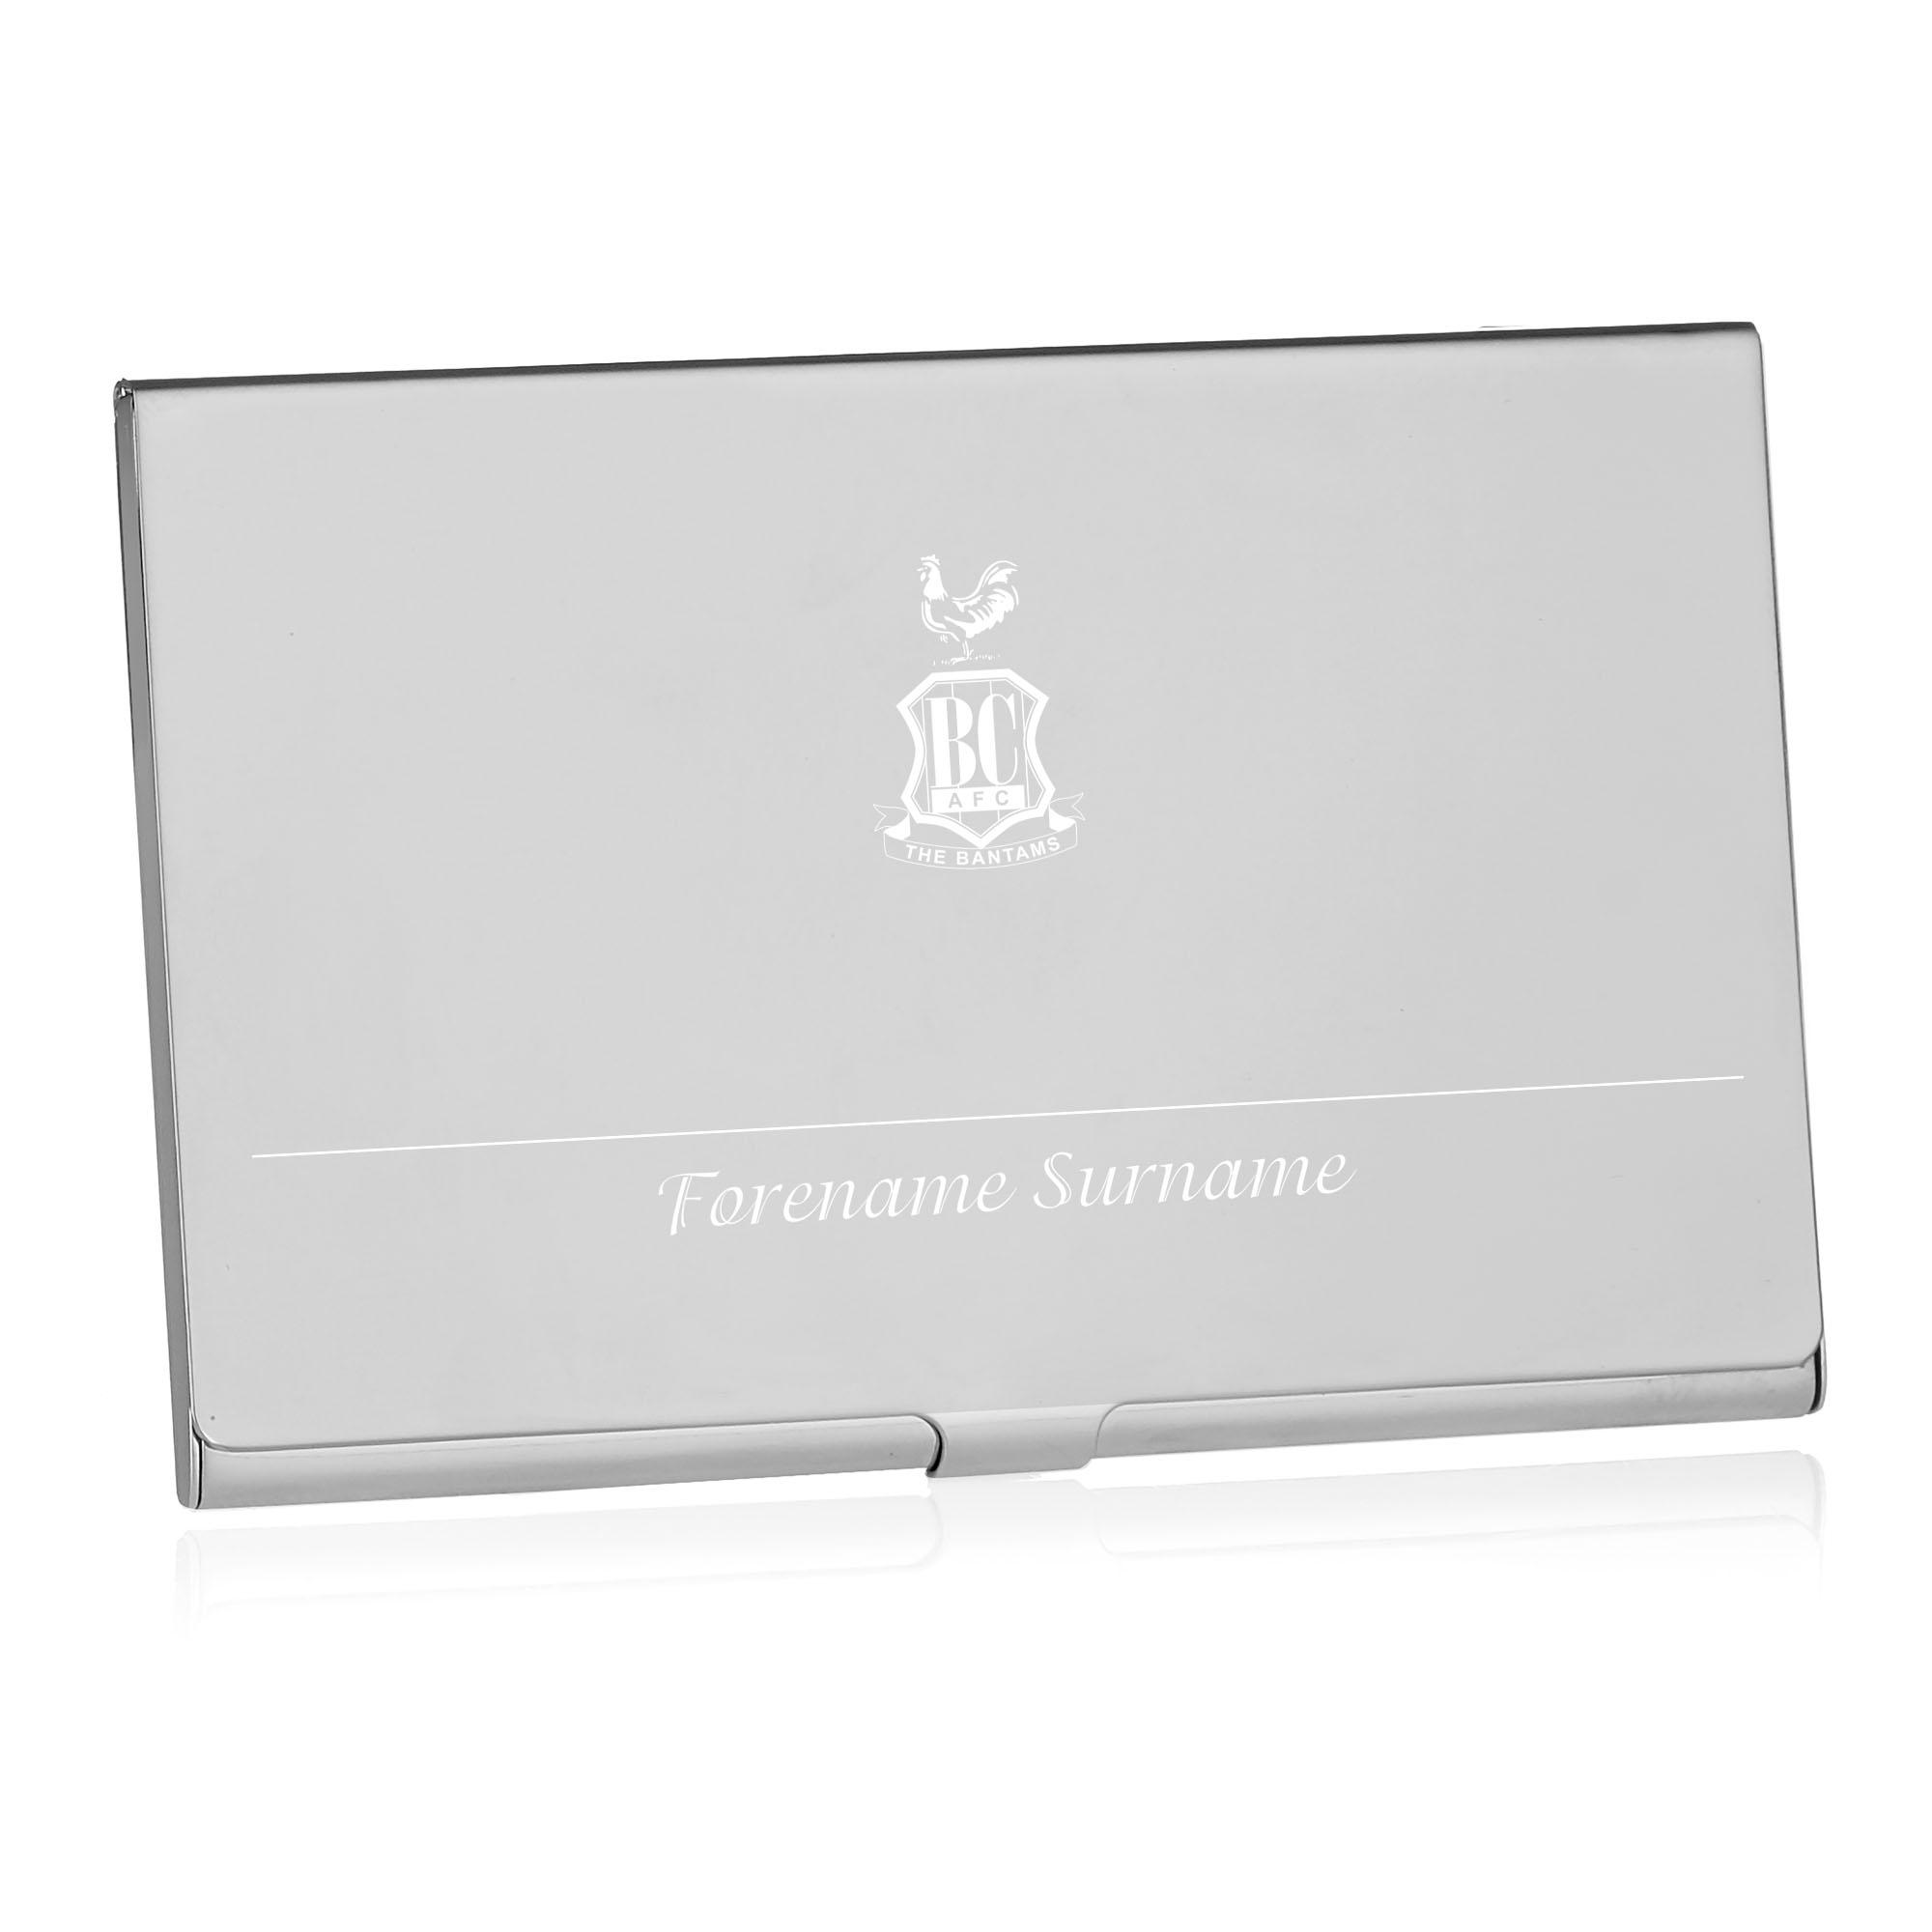 Bradford City AFC Executive Business Card Holder